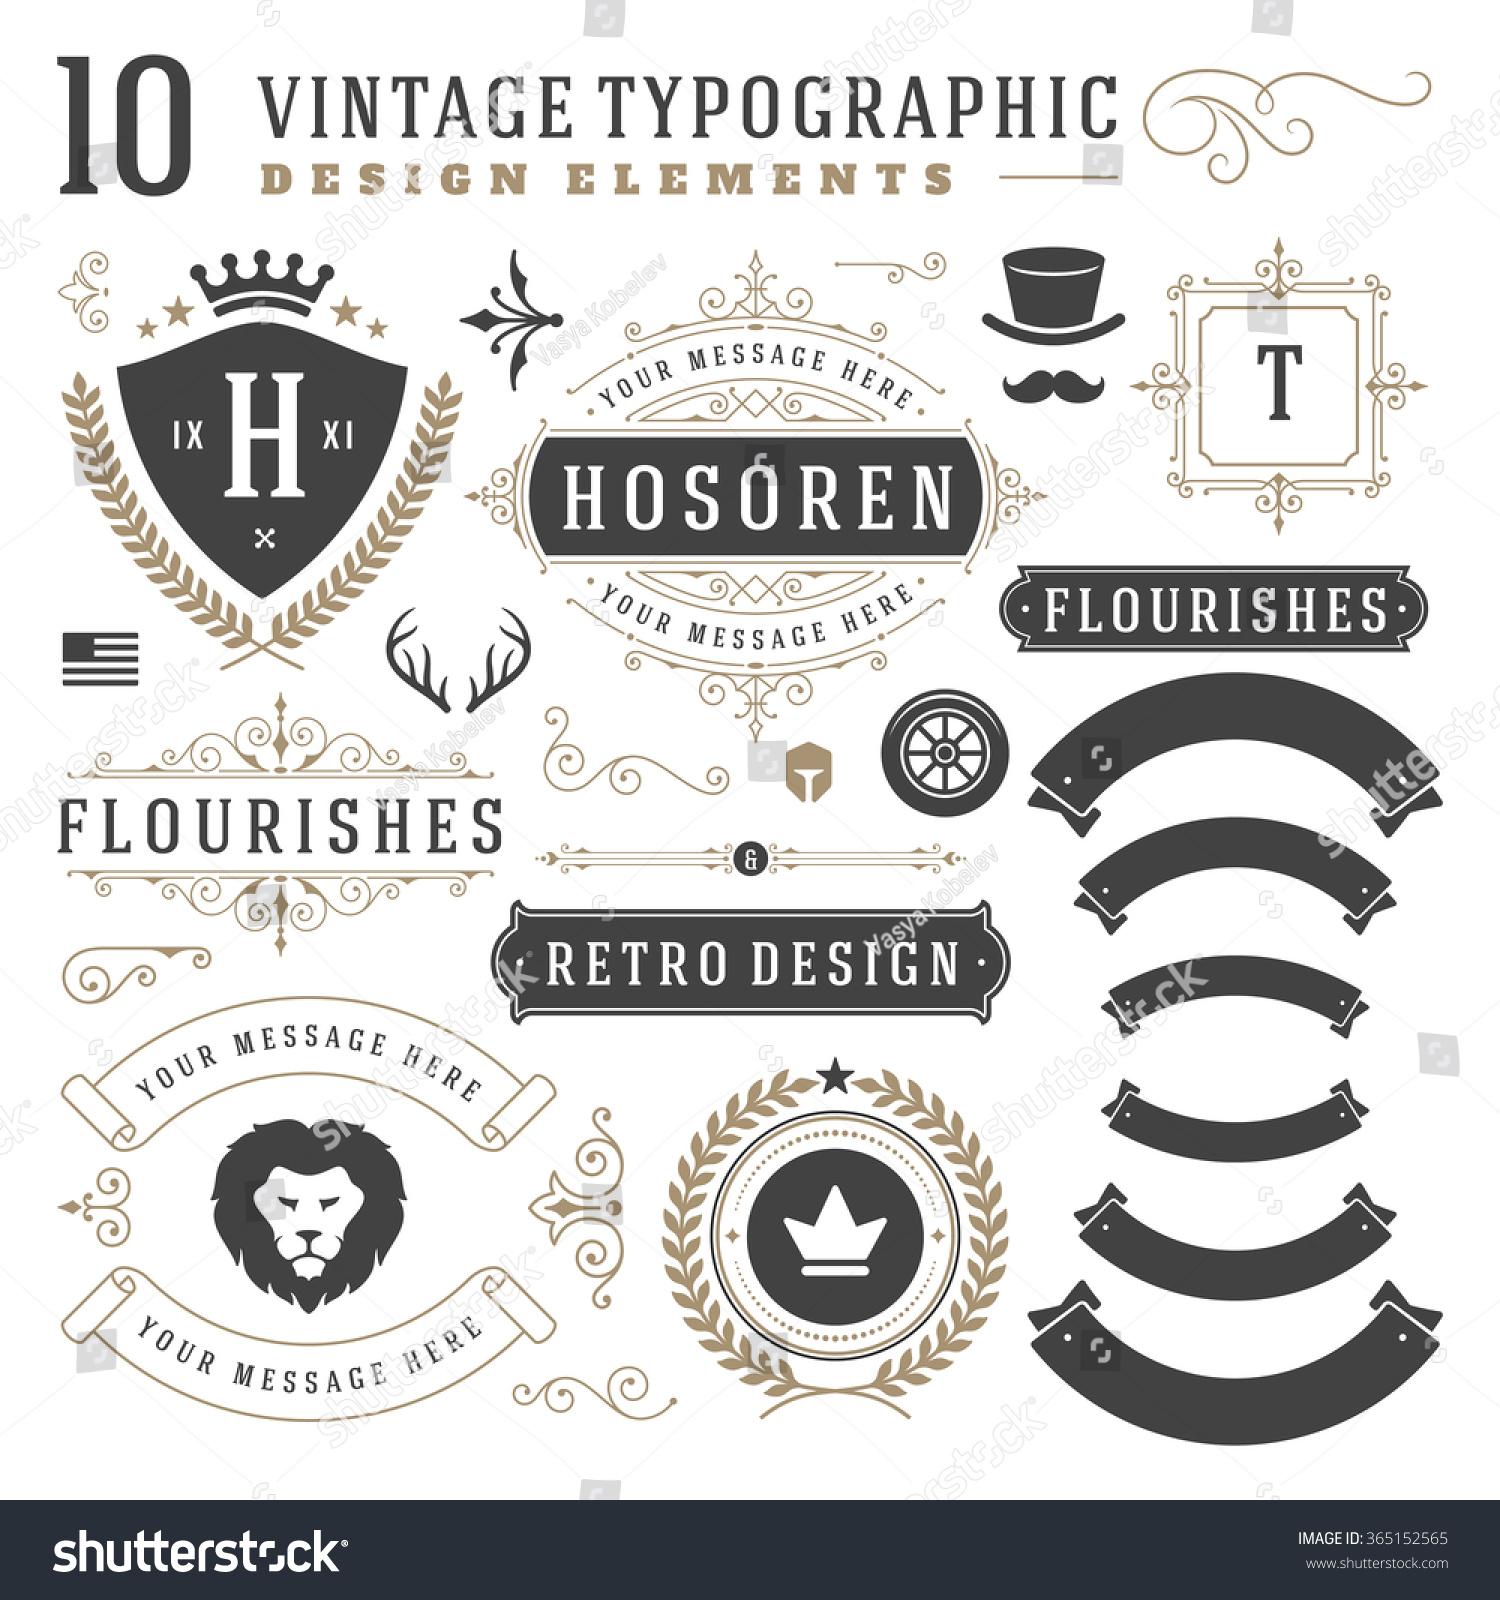 Vintage Design Elements Arrows Retro Typography Stock